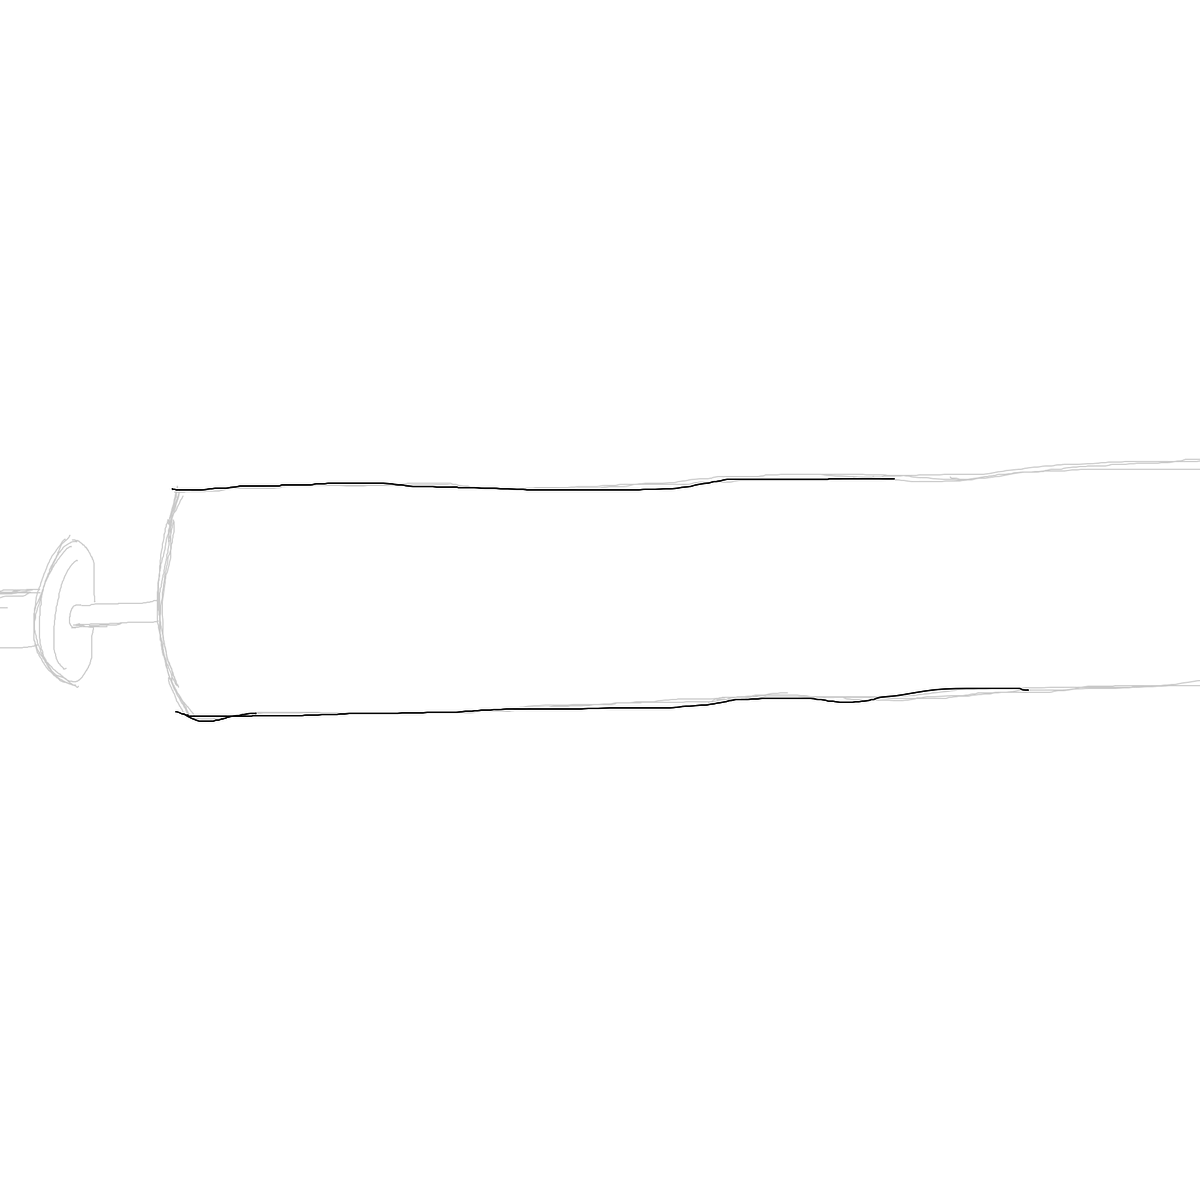 BAAAM drawing#10680 lat:51.0362739562988300lng: -114.0524826049804700